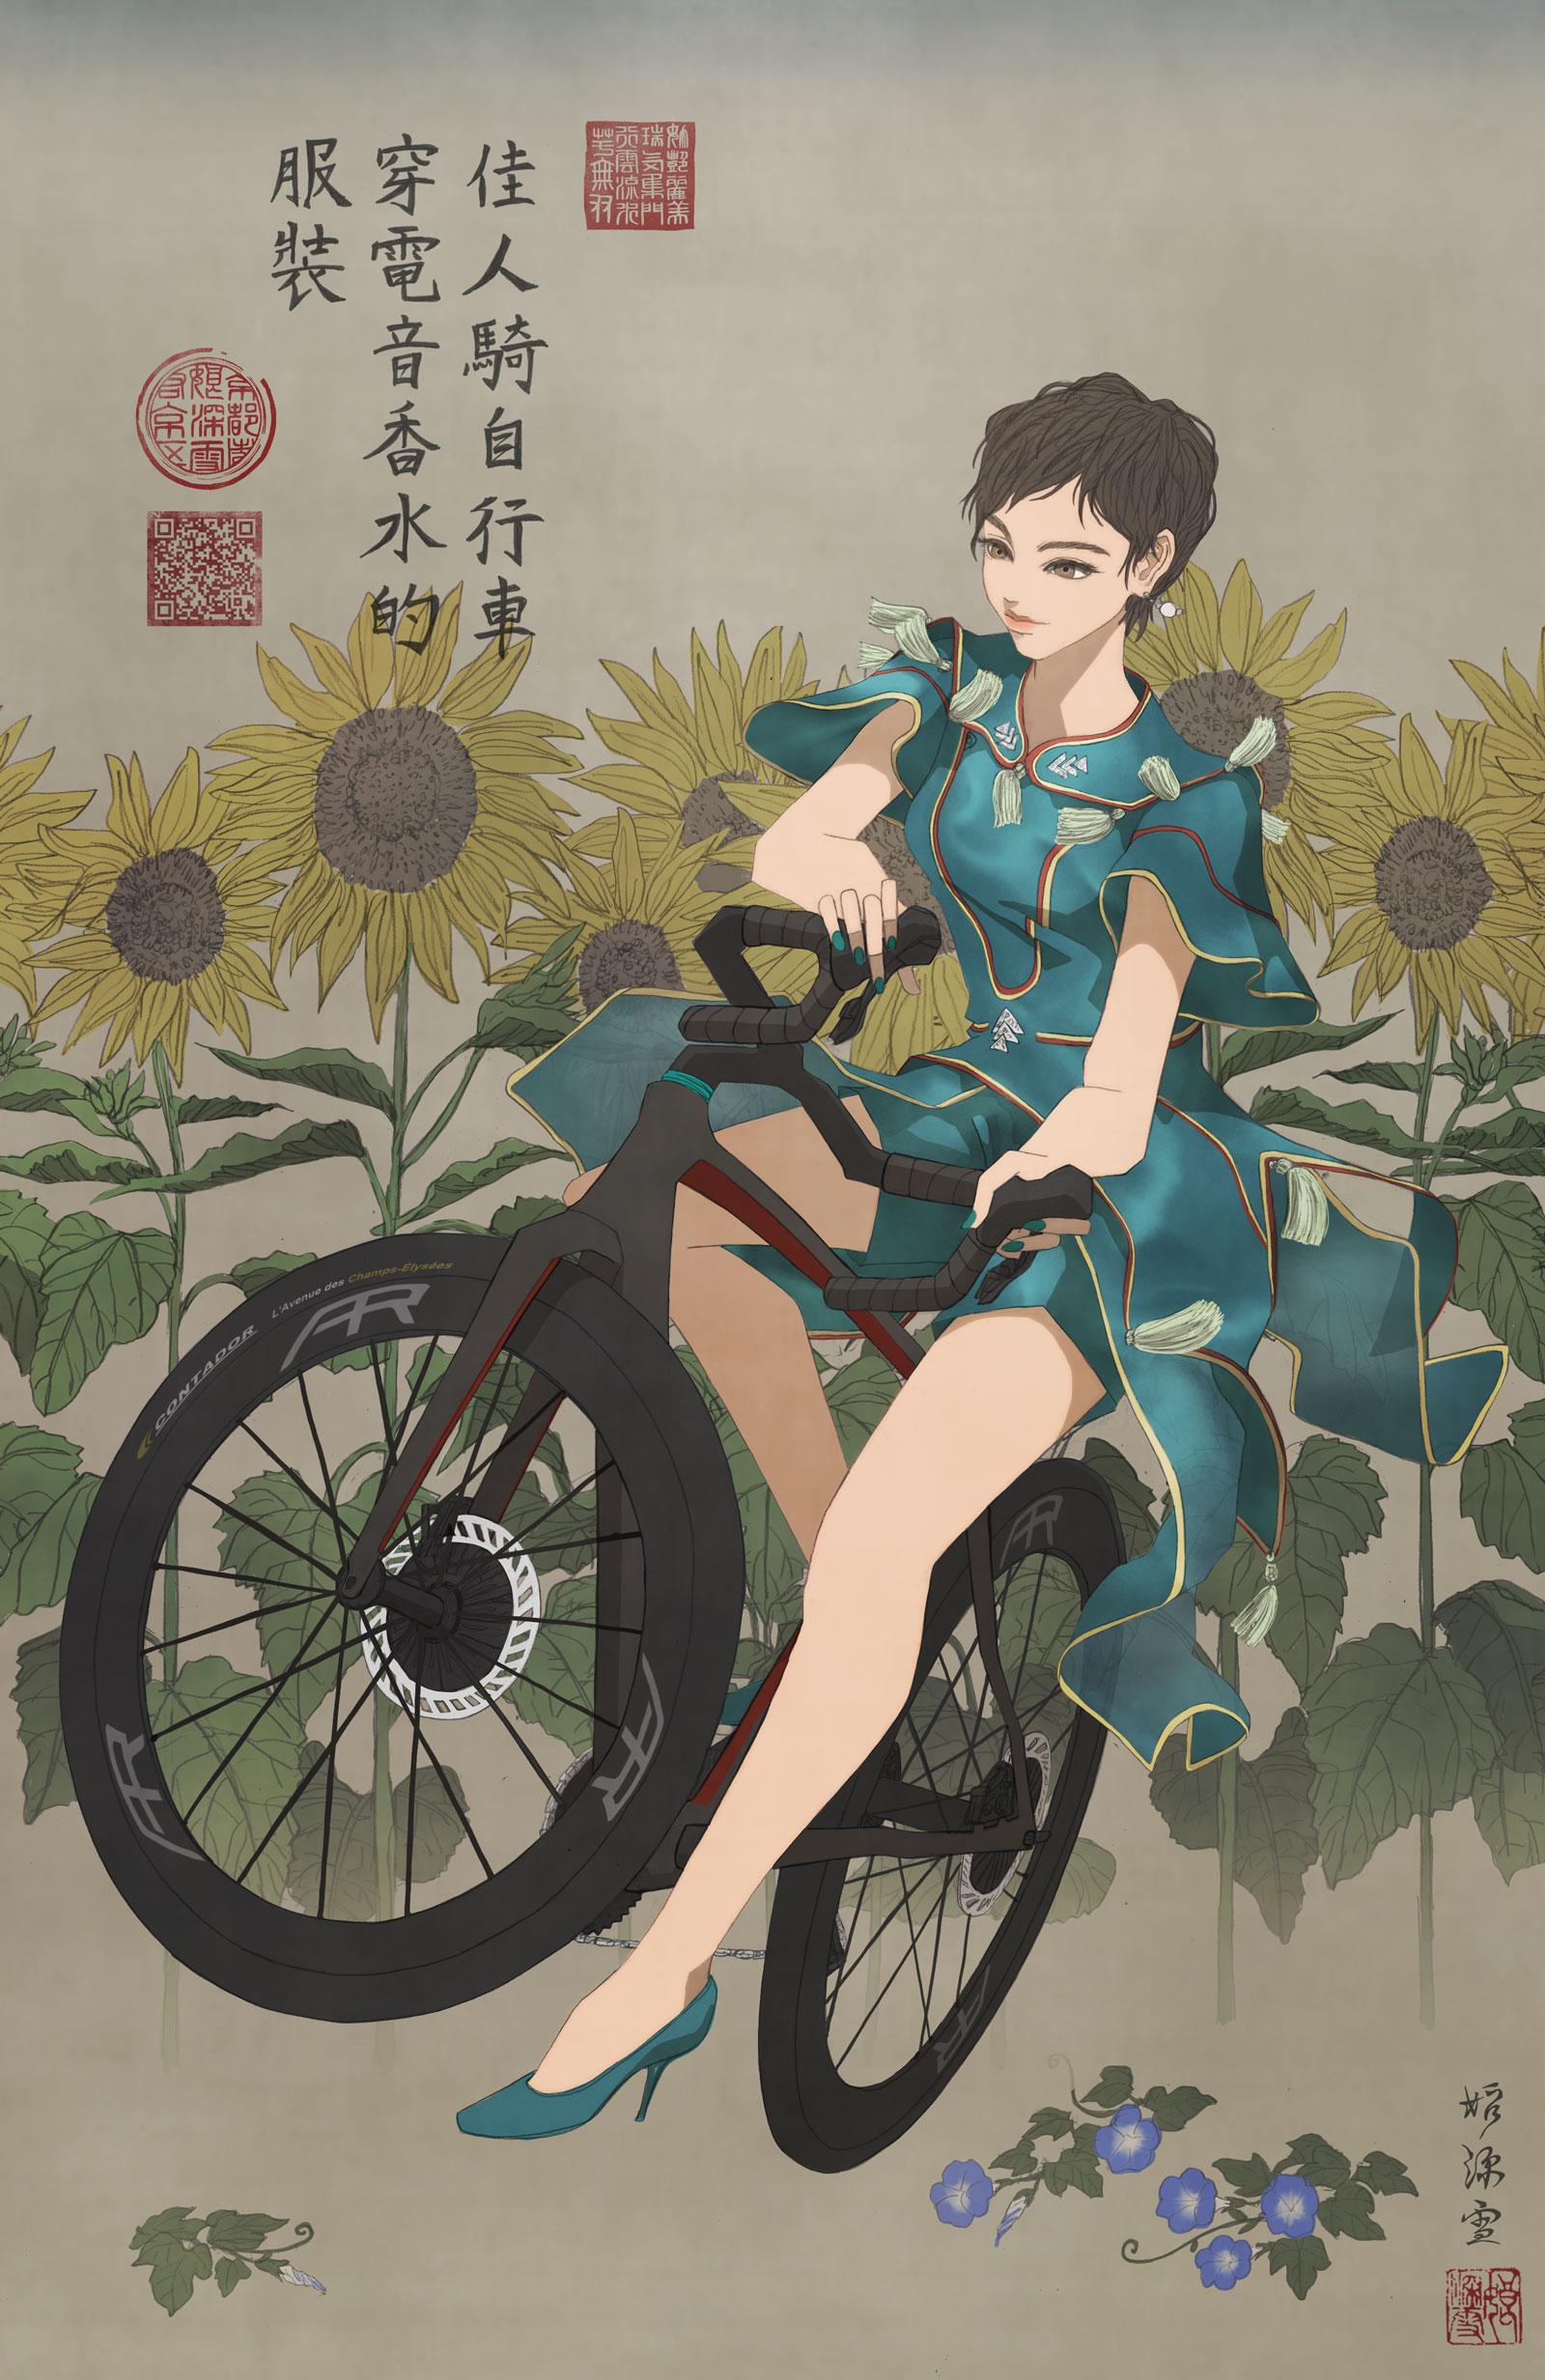 PerfumeのCling Clingの衣装を着て自転車に乗る女性